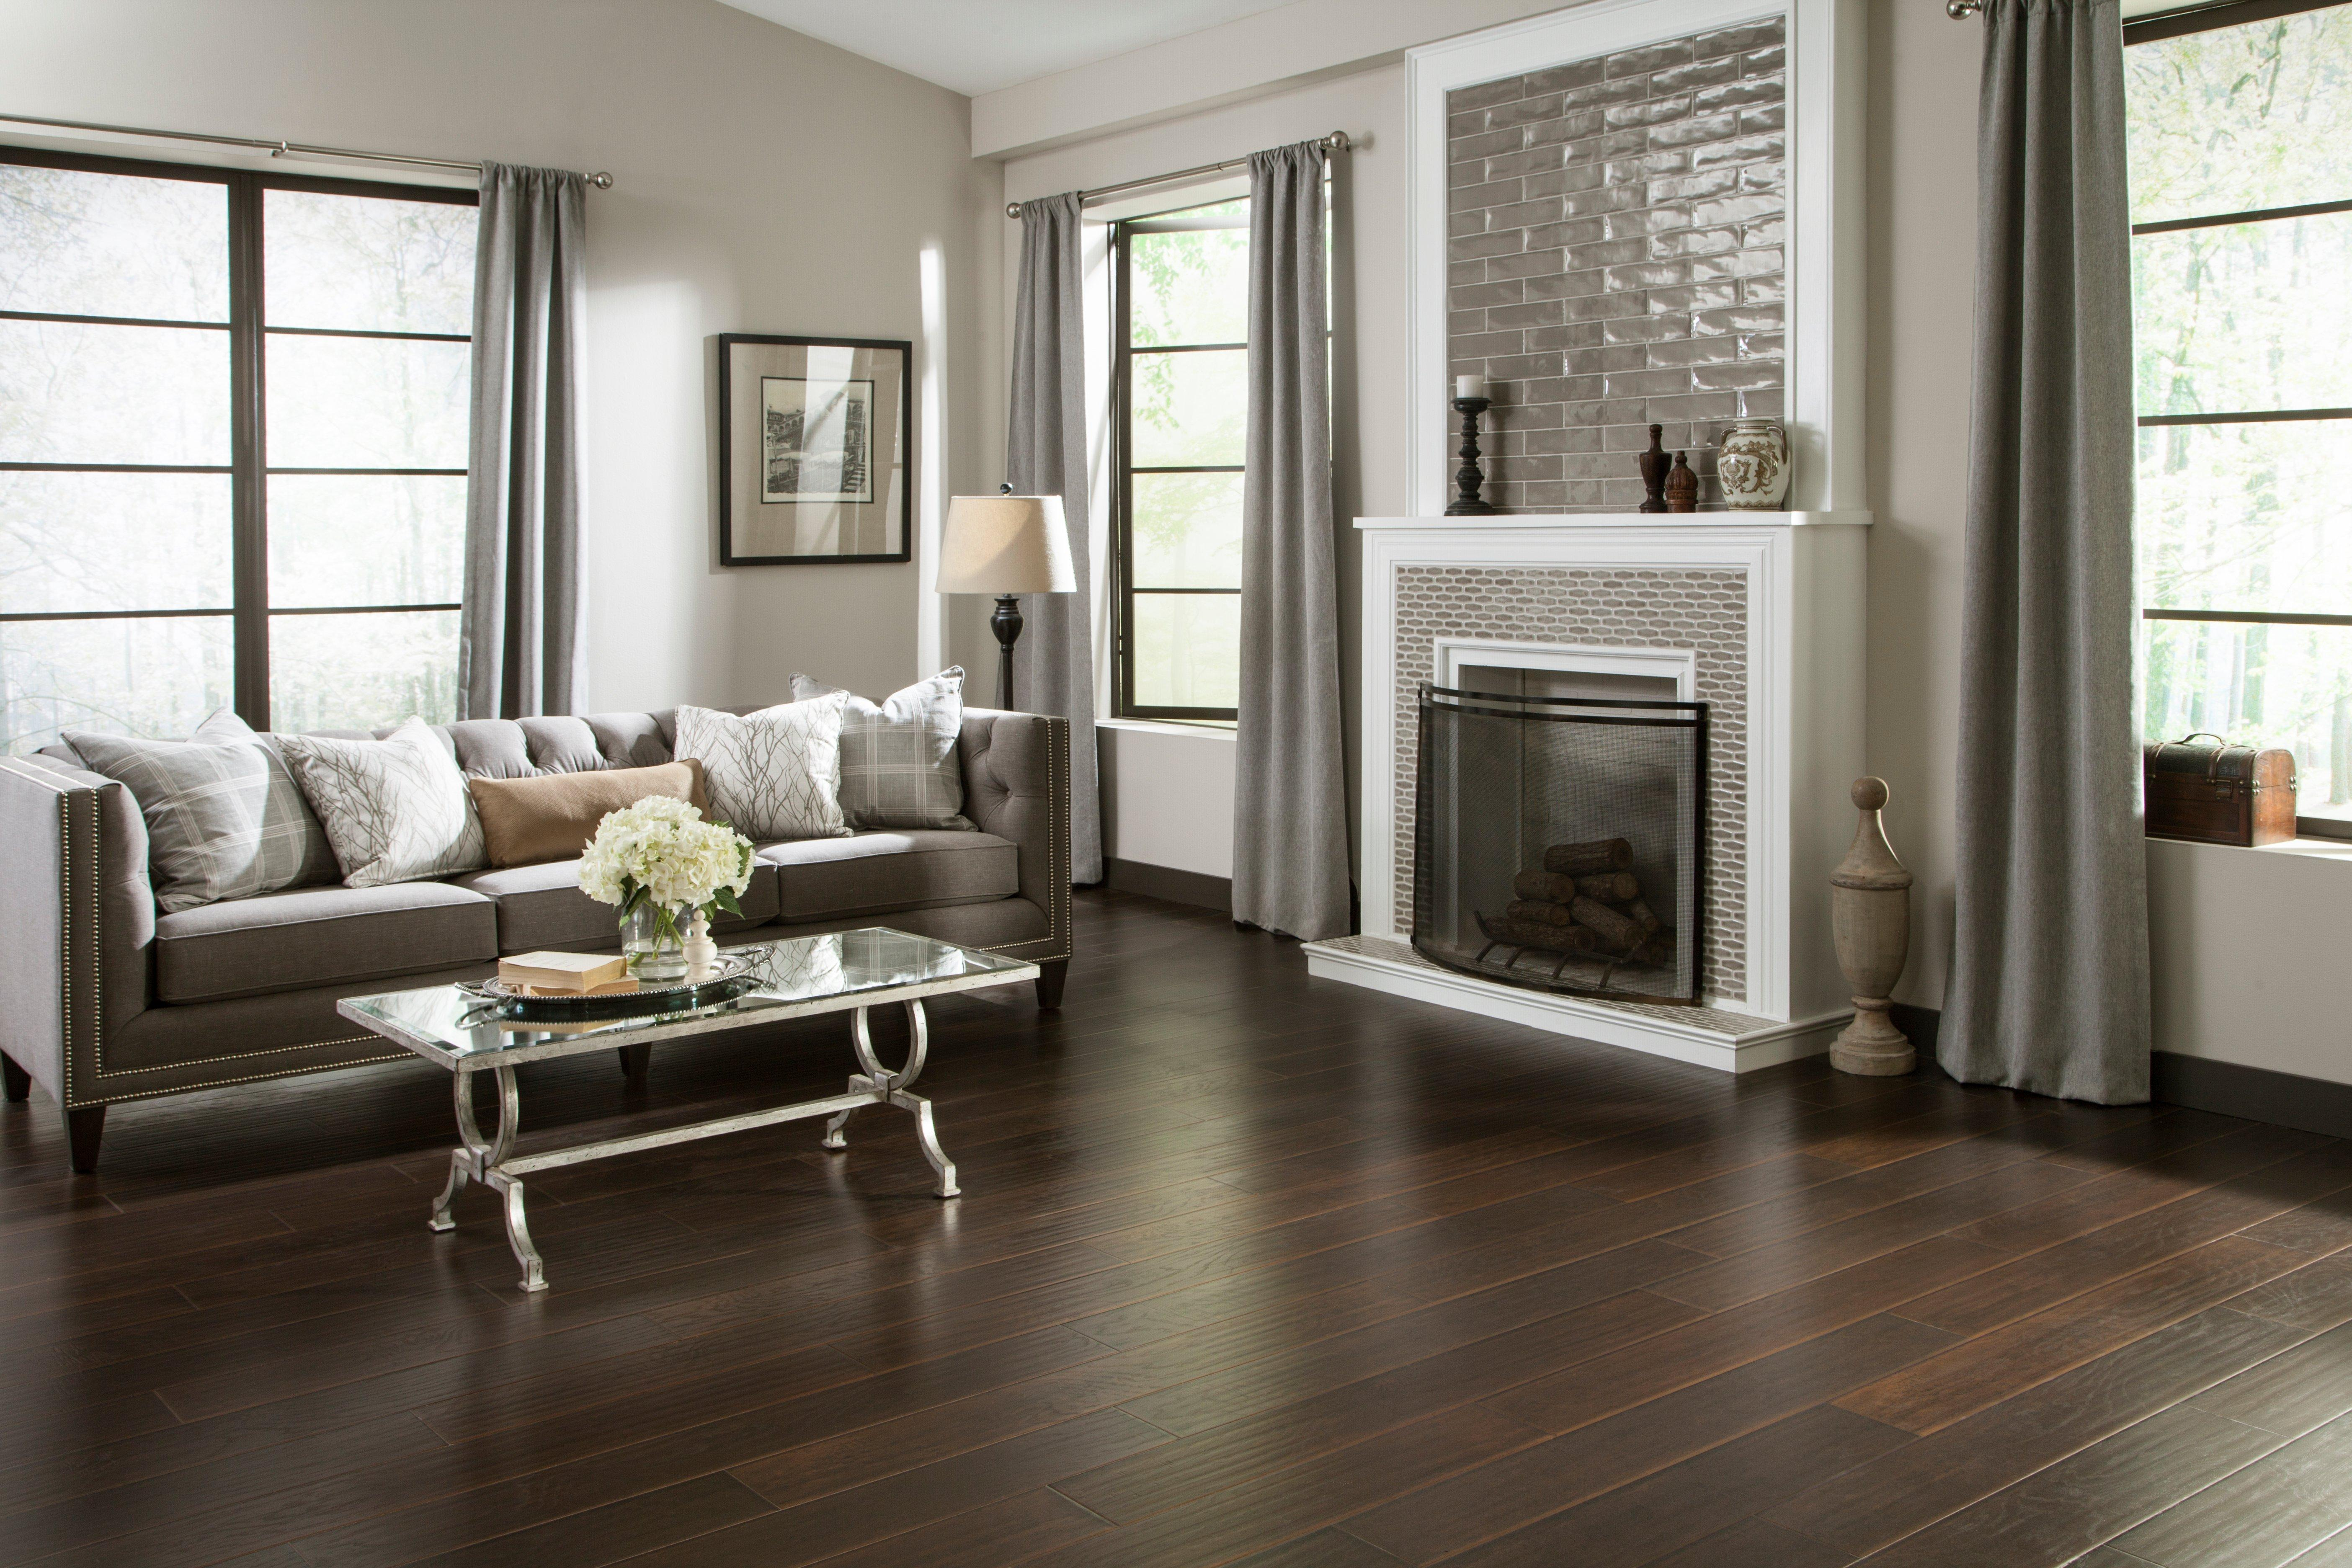 Floor And Decor Hilliard Ohio 100 Interior Floor And Decor